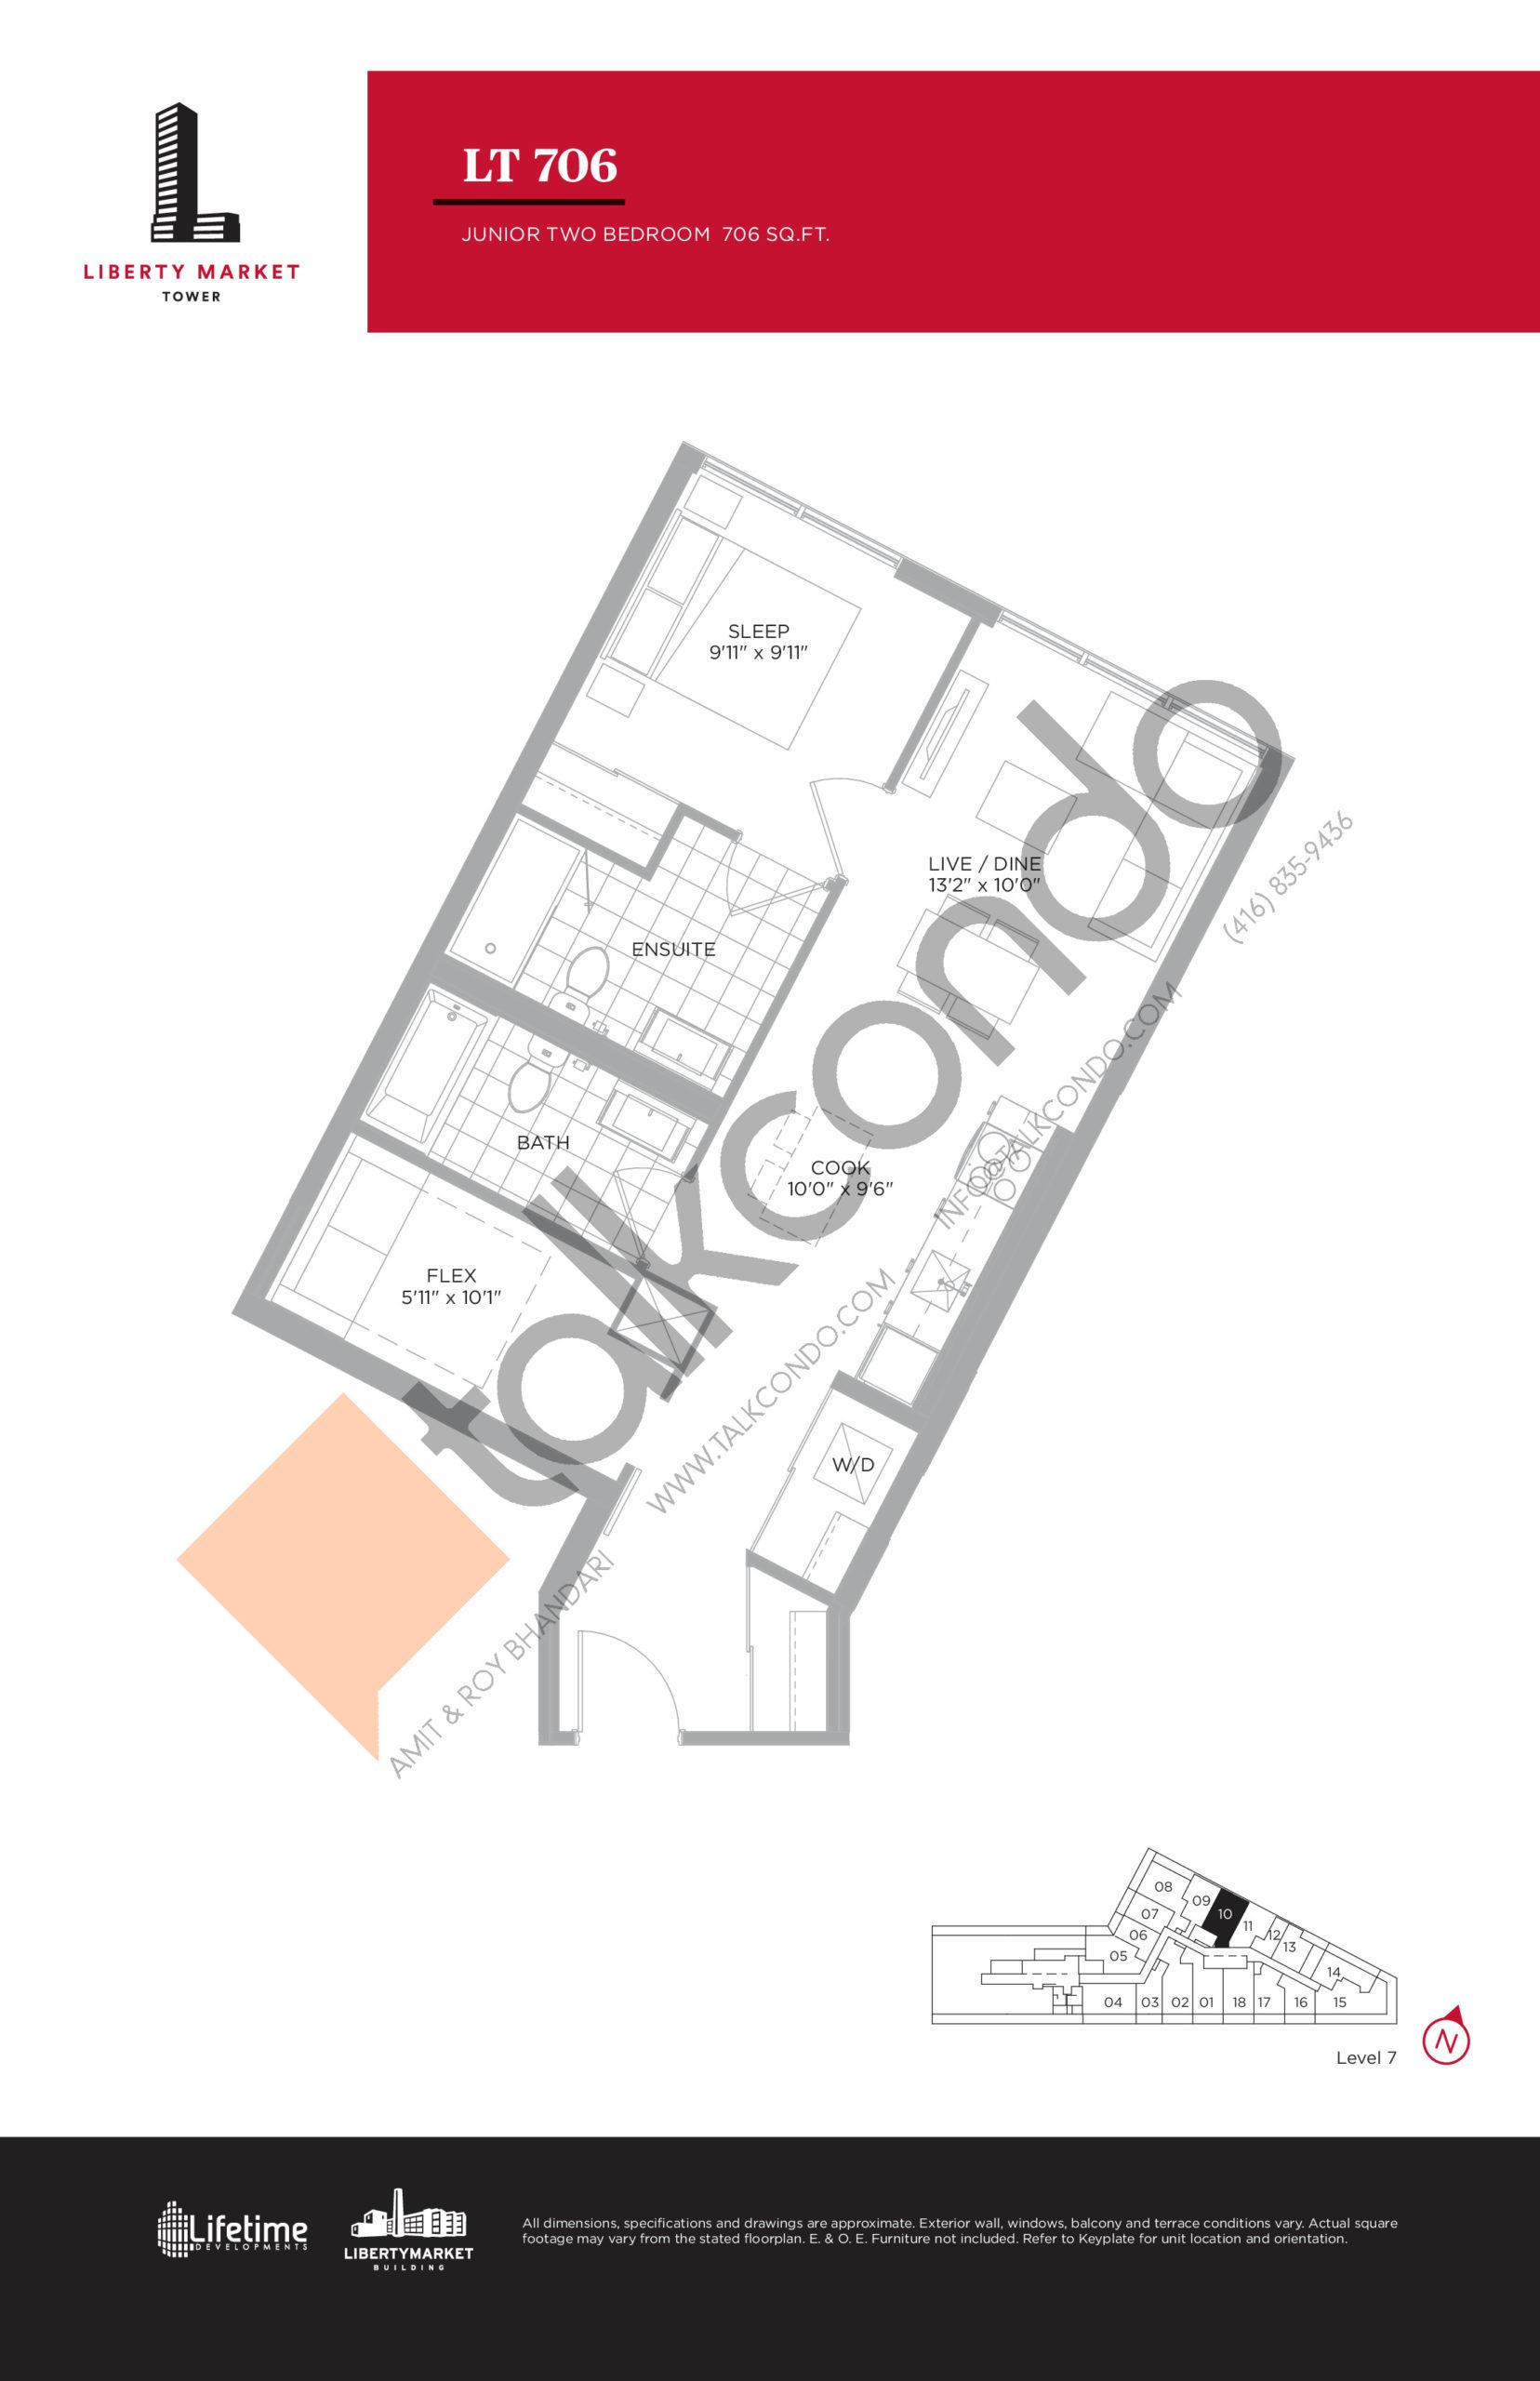 LT 706 Floor Plan at Liberty Market Tower Condos - 706 sq.ft